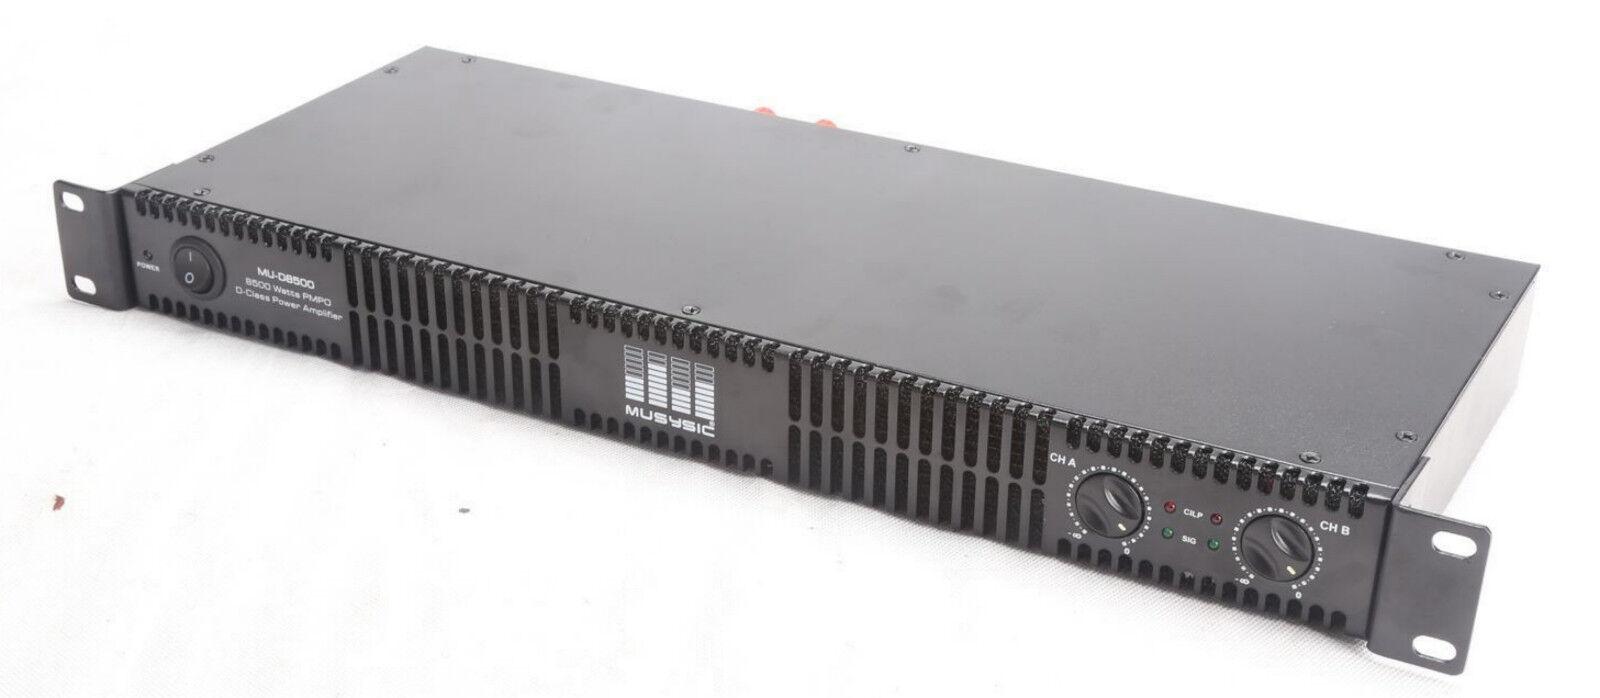 musysic professional 2 channel 8500 watts d class 1u power amplifier mu d8500 amplifiers. Black Bedroom Furniture Sets. Home Design Ideas